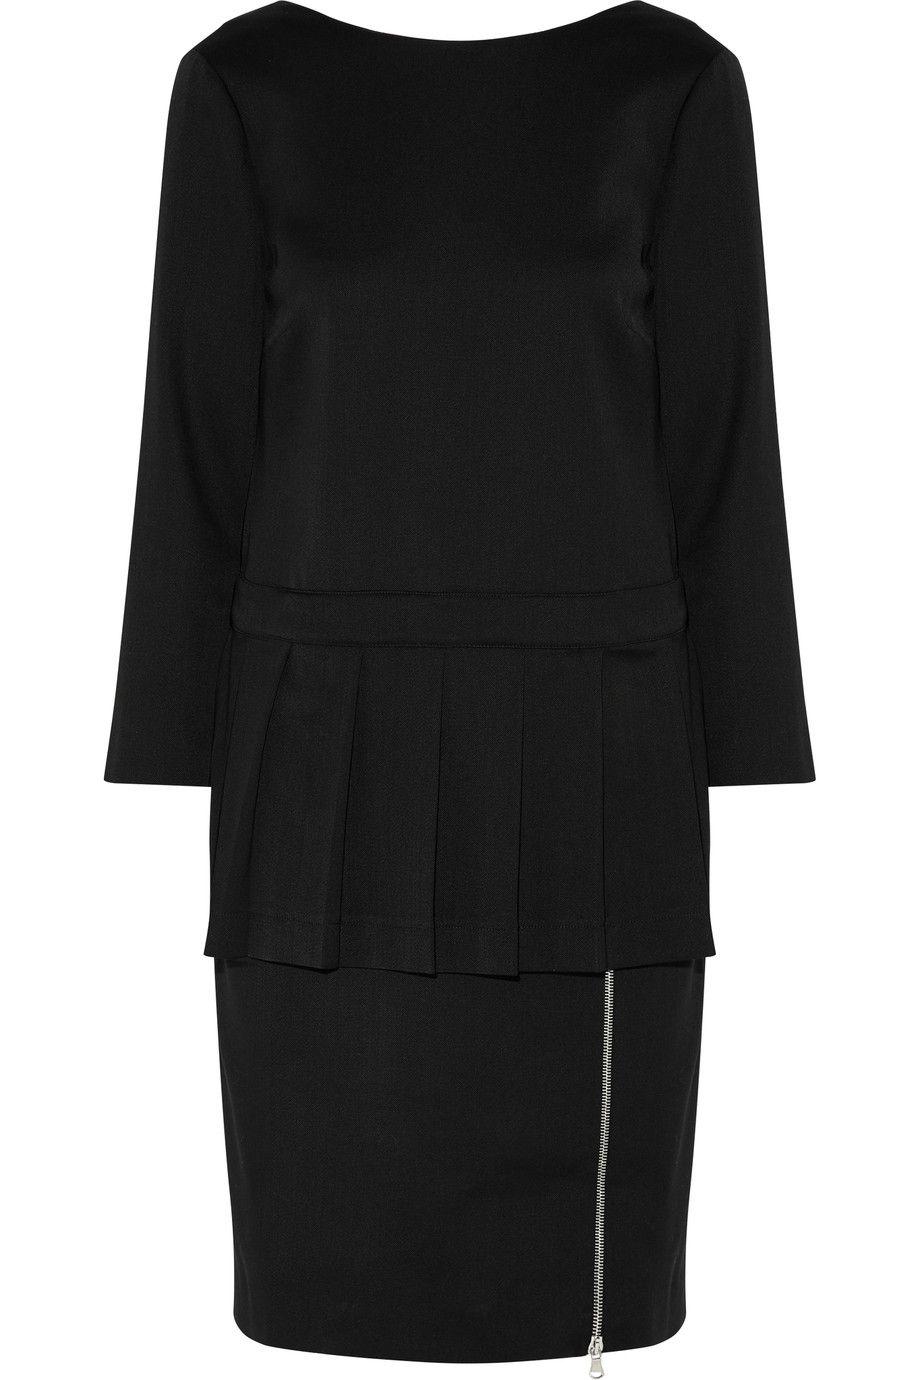 Moschino Woman Pleated Wool-blend Twill Peplum Dress Black Size 38 Moschino 4GgVHYfTq0